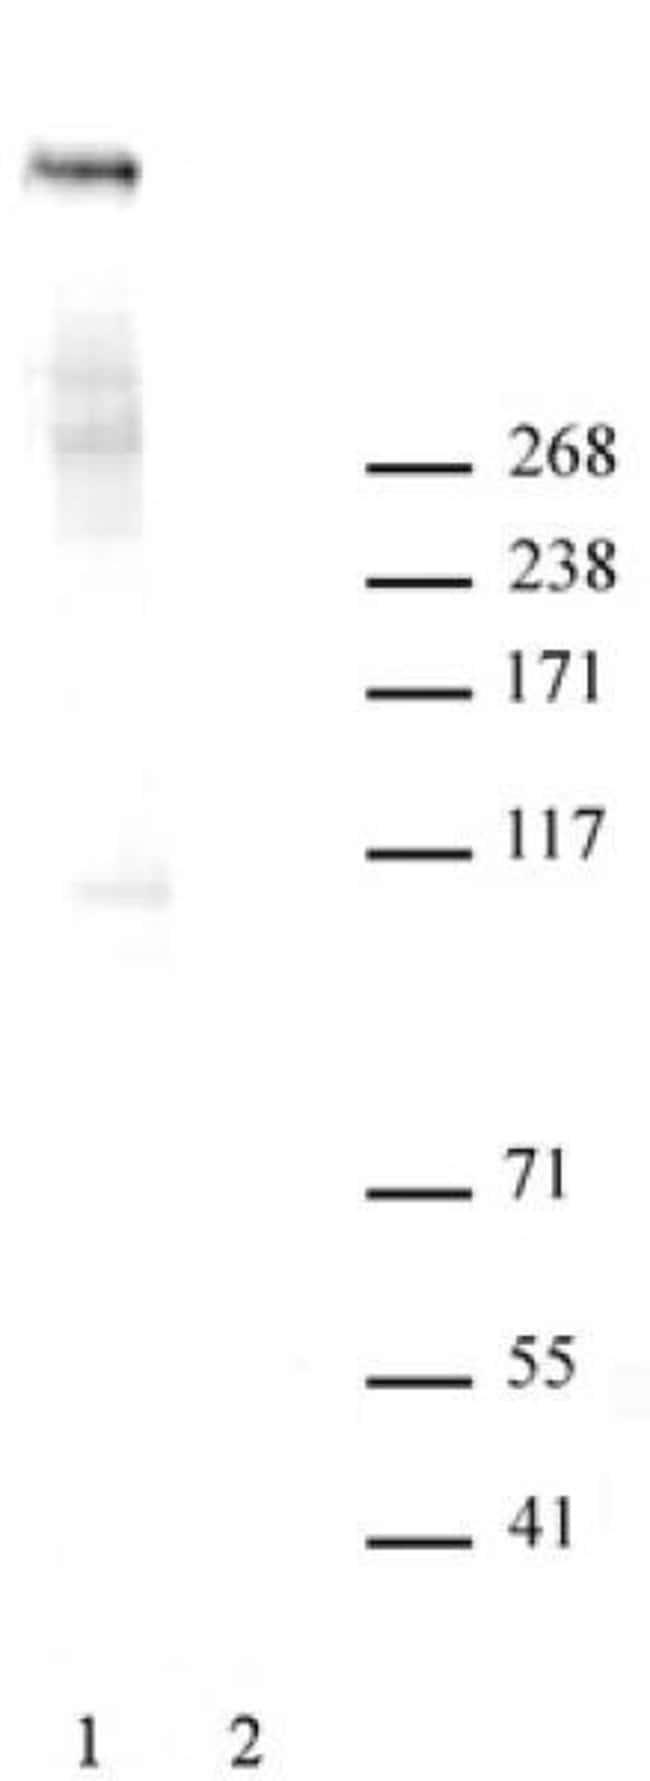 Ki-67 Rabbit anti-Human, Unconjugated, Polyclonal, Active Motif:Antibodies:Primary